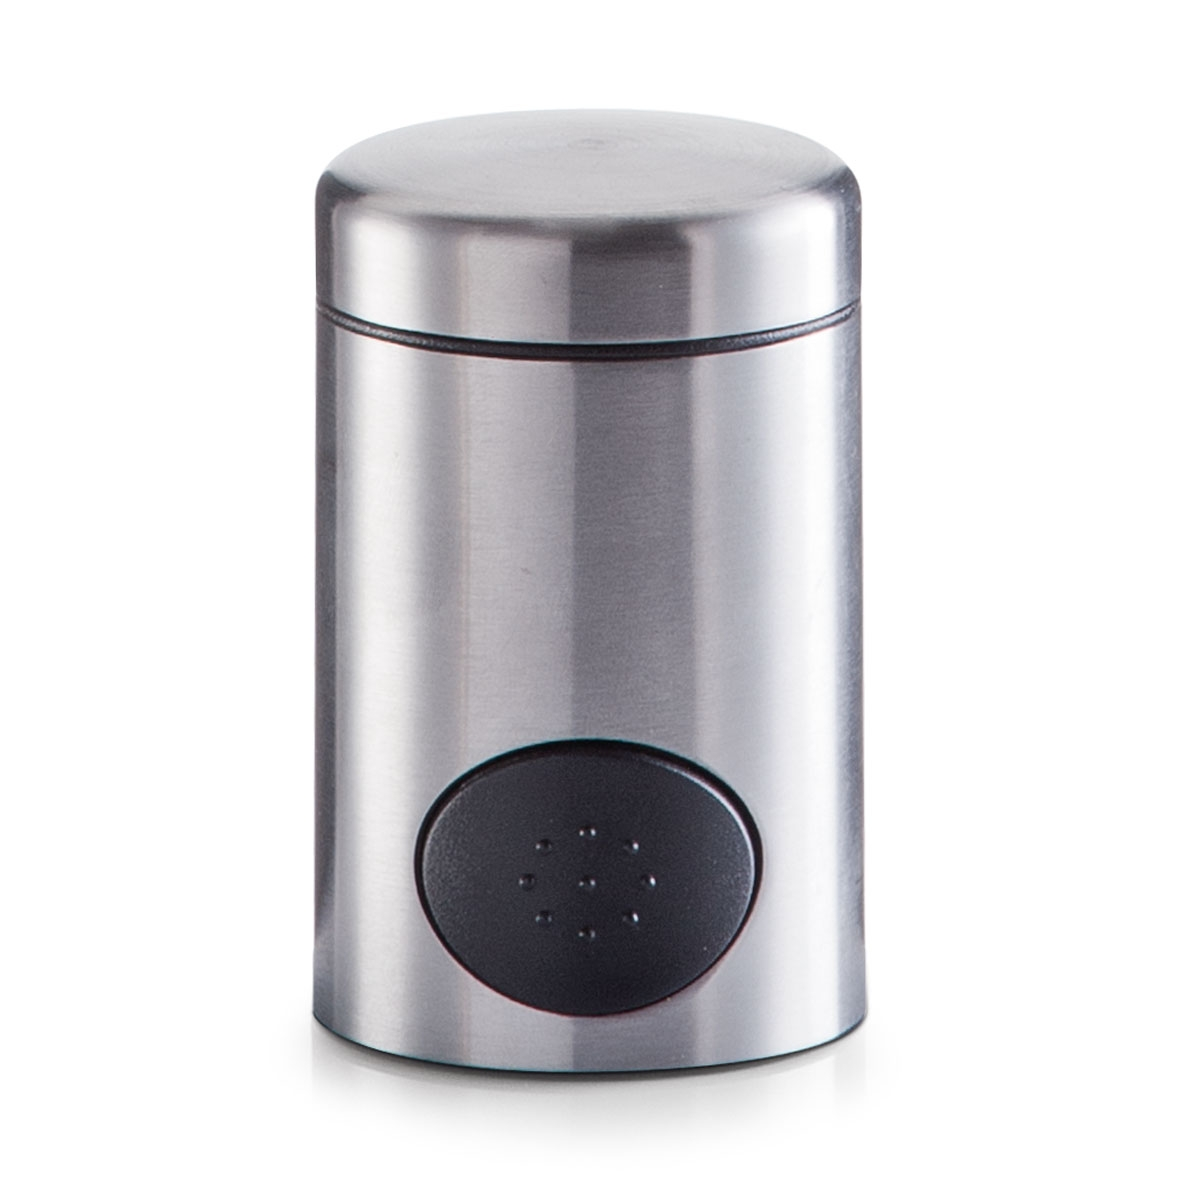 Dispenser pentru indulcitor Push, din inox, Ø 5xH8,5 cm